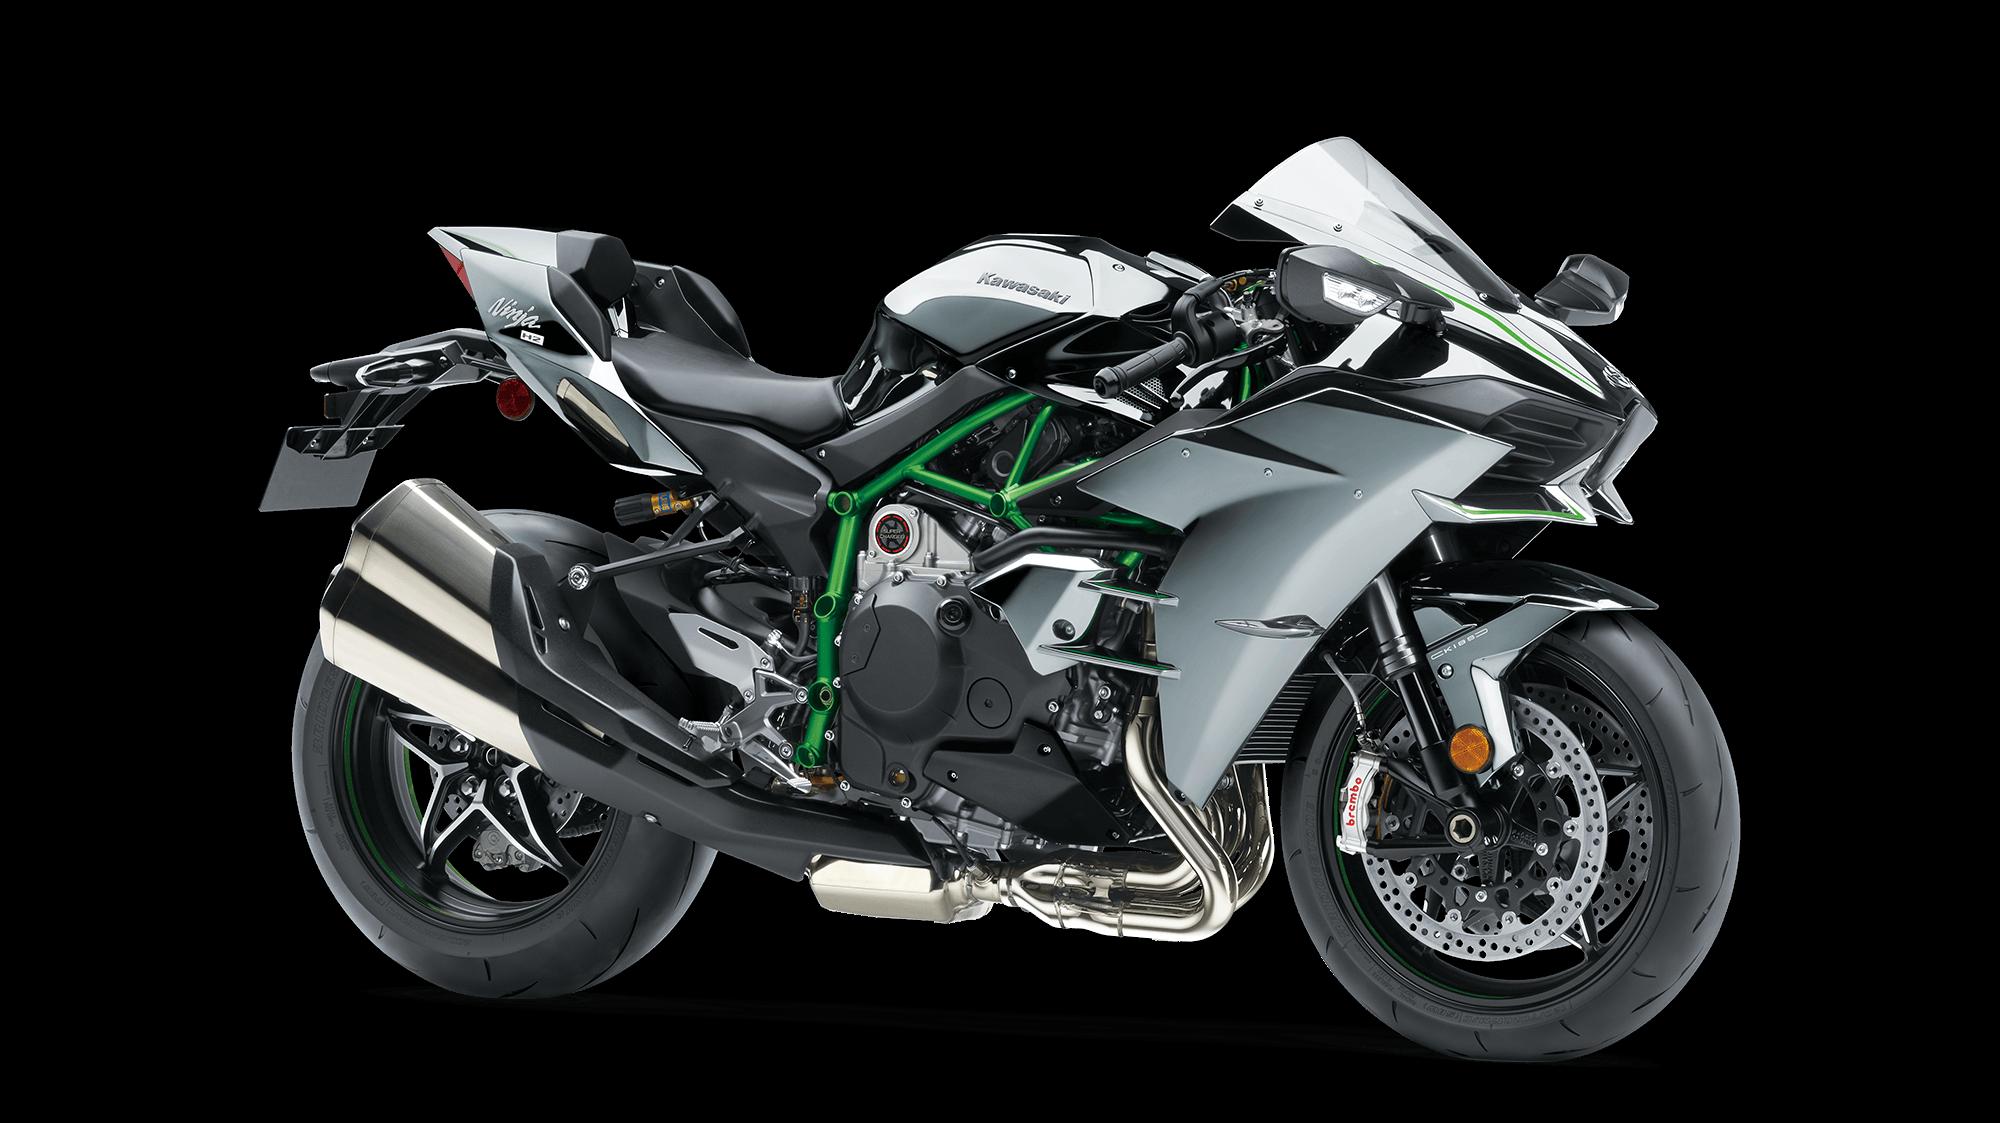 2019 Ninja H2 Ninja Motorcycle By Kawasaki